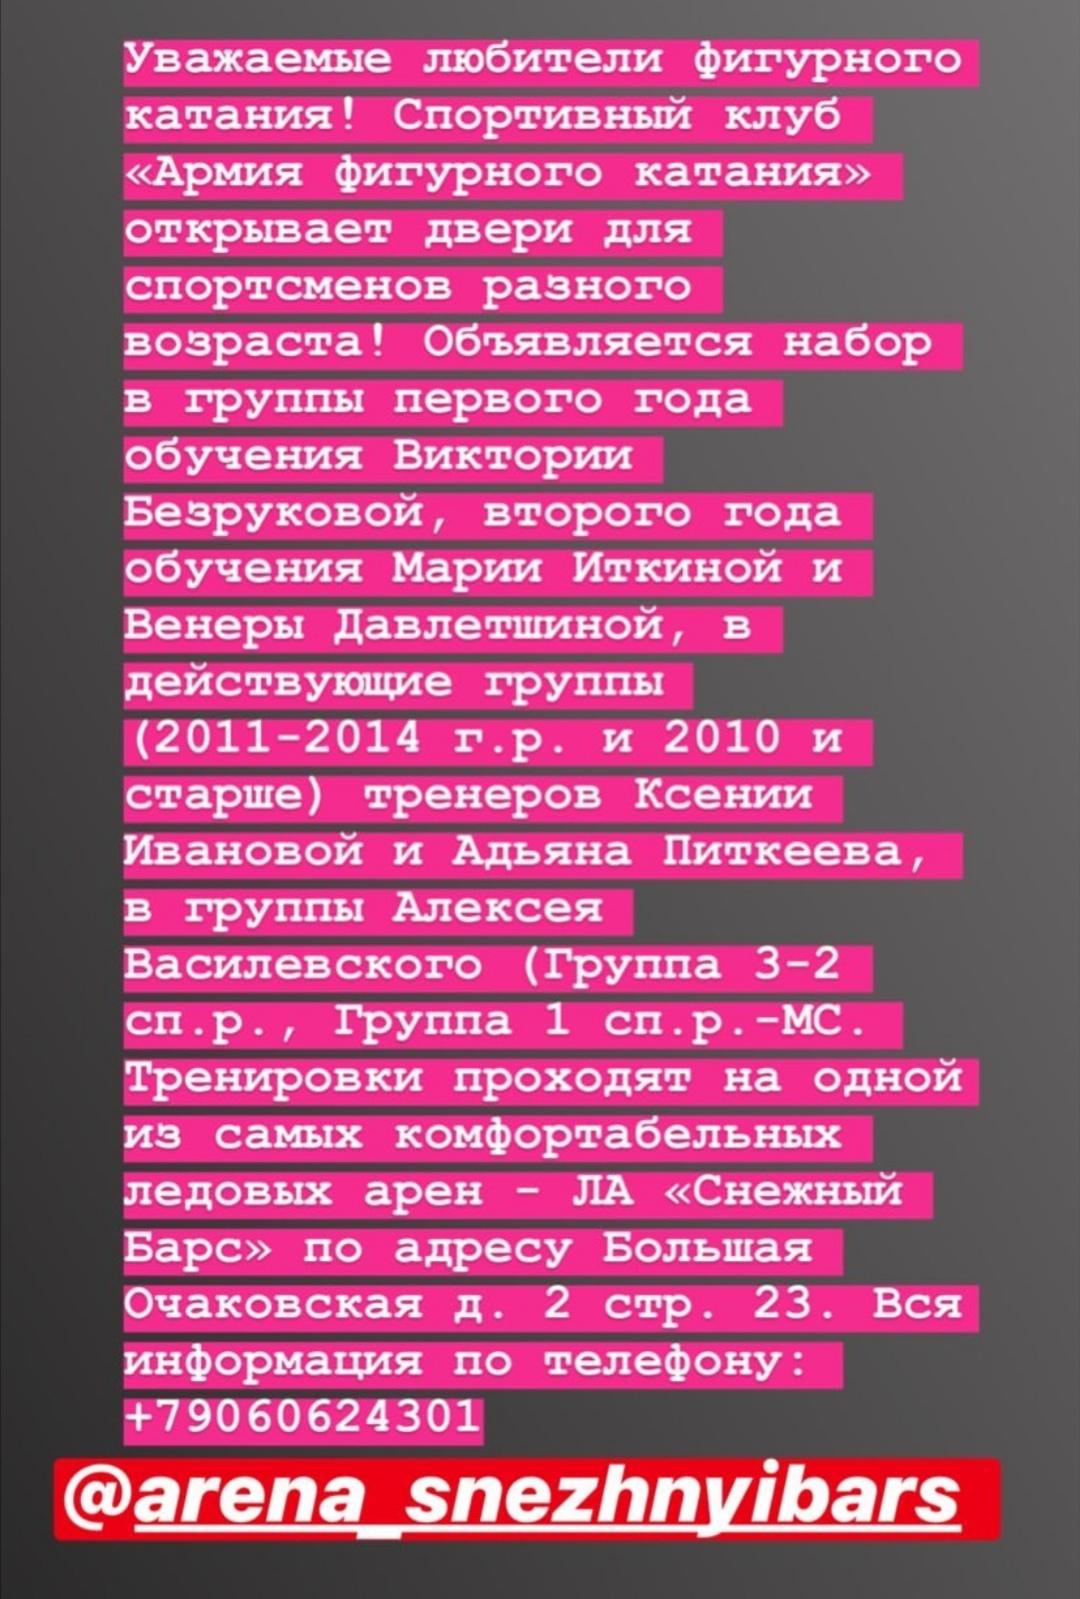 https://i2.imageban.ru/out/2019/09/02/63bd394b3cb59a1dfae9598088d0f97c.jpg